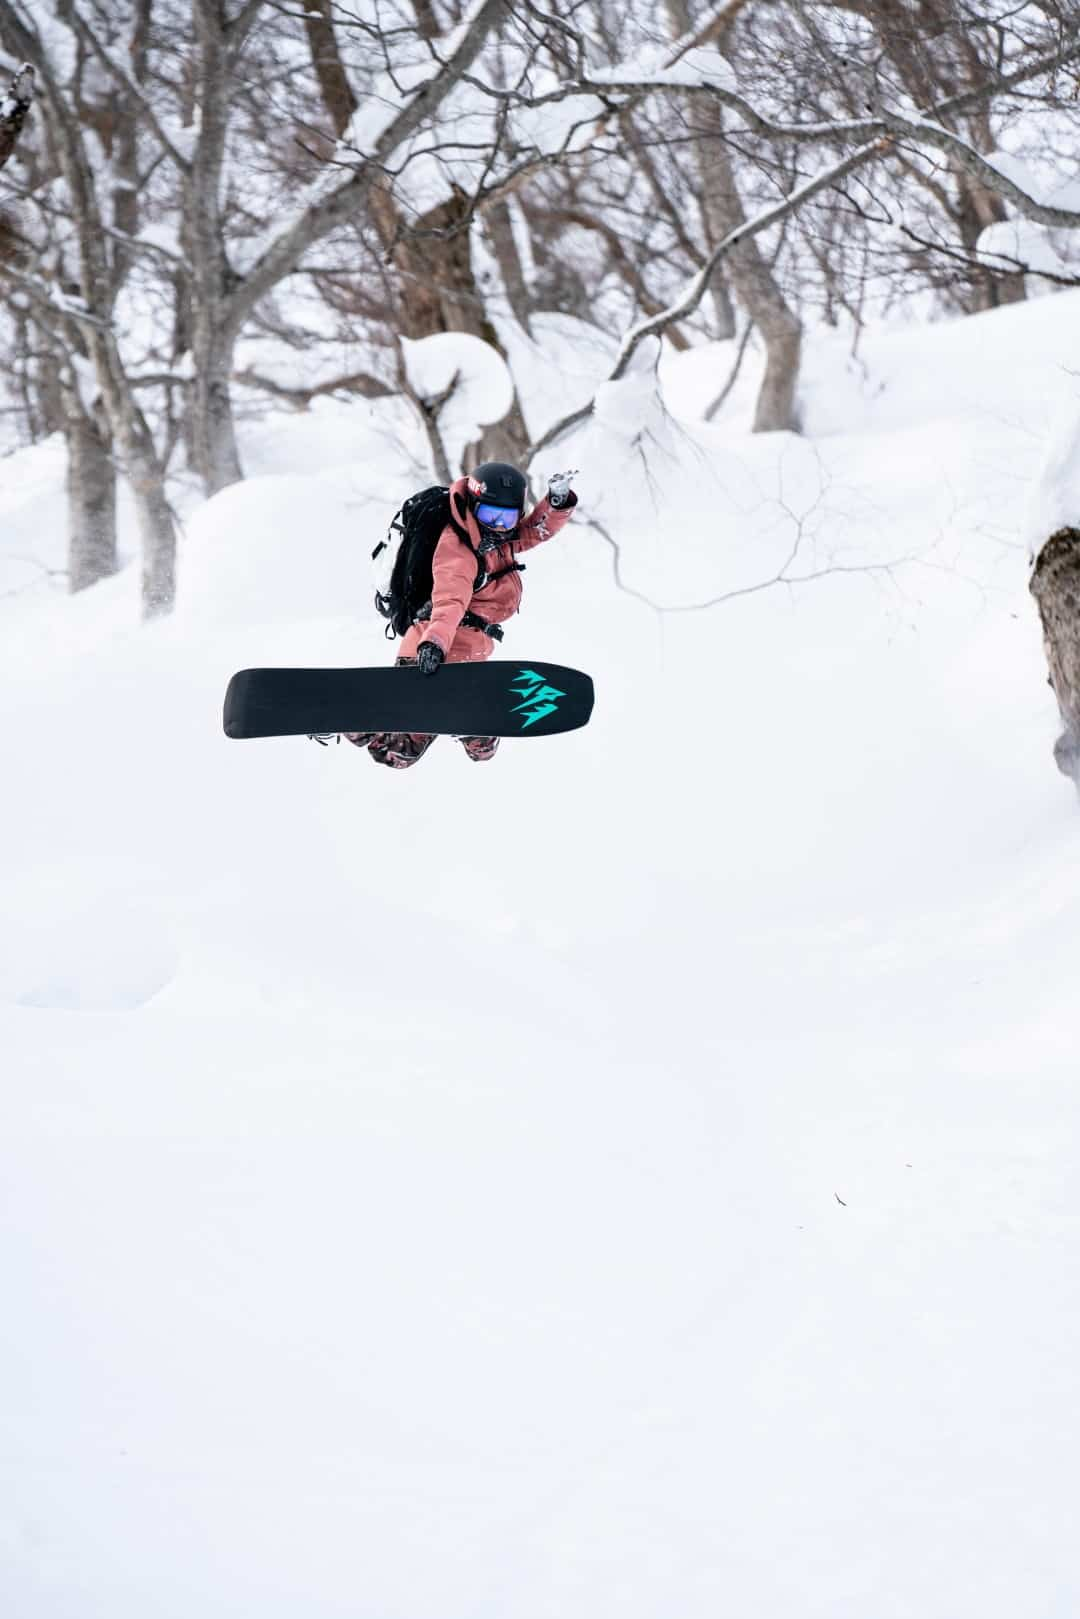 Elena Hight Freeriden in Japan